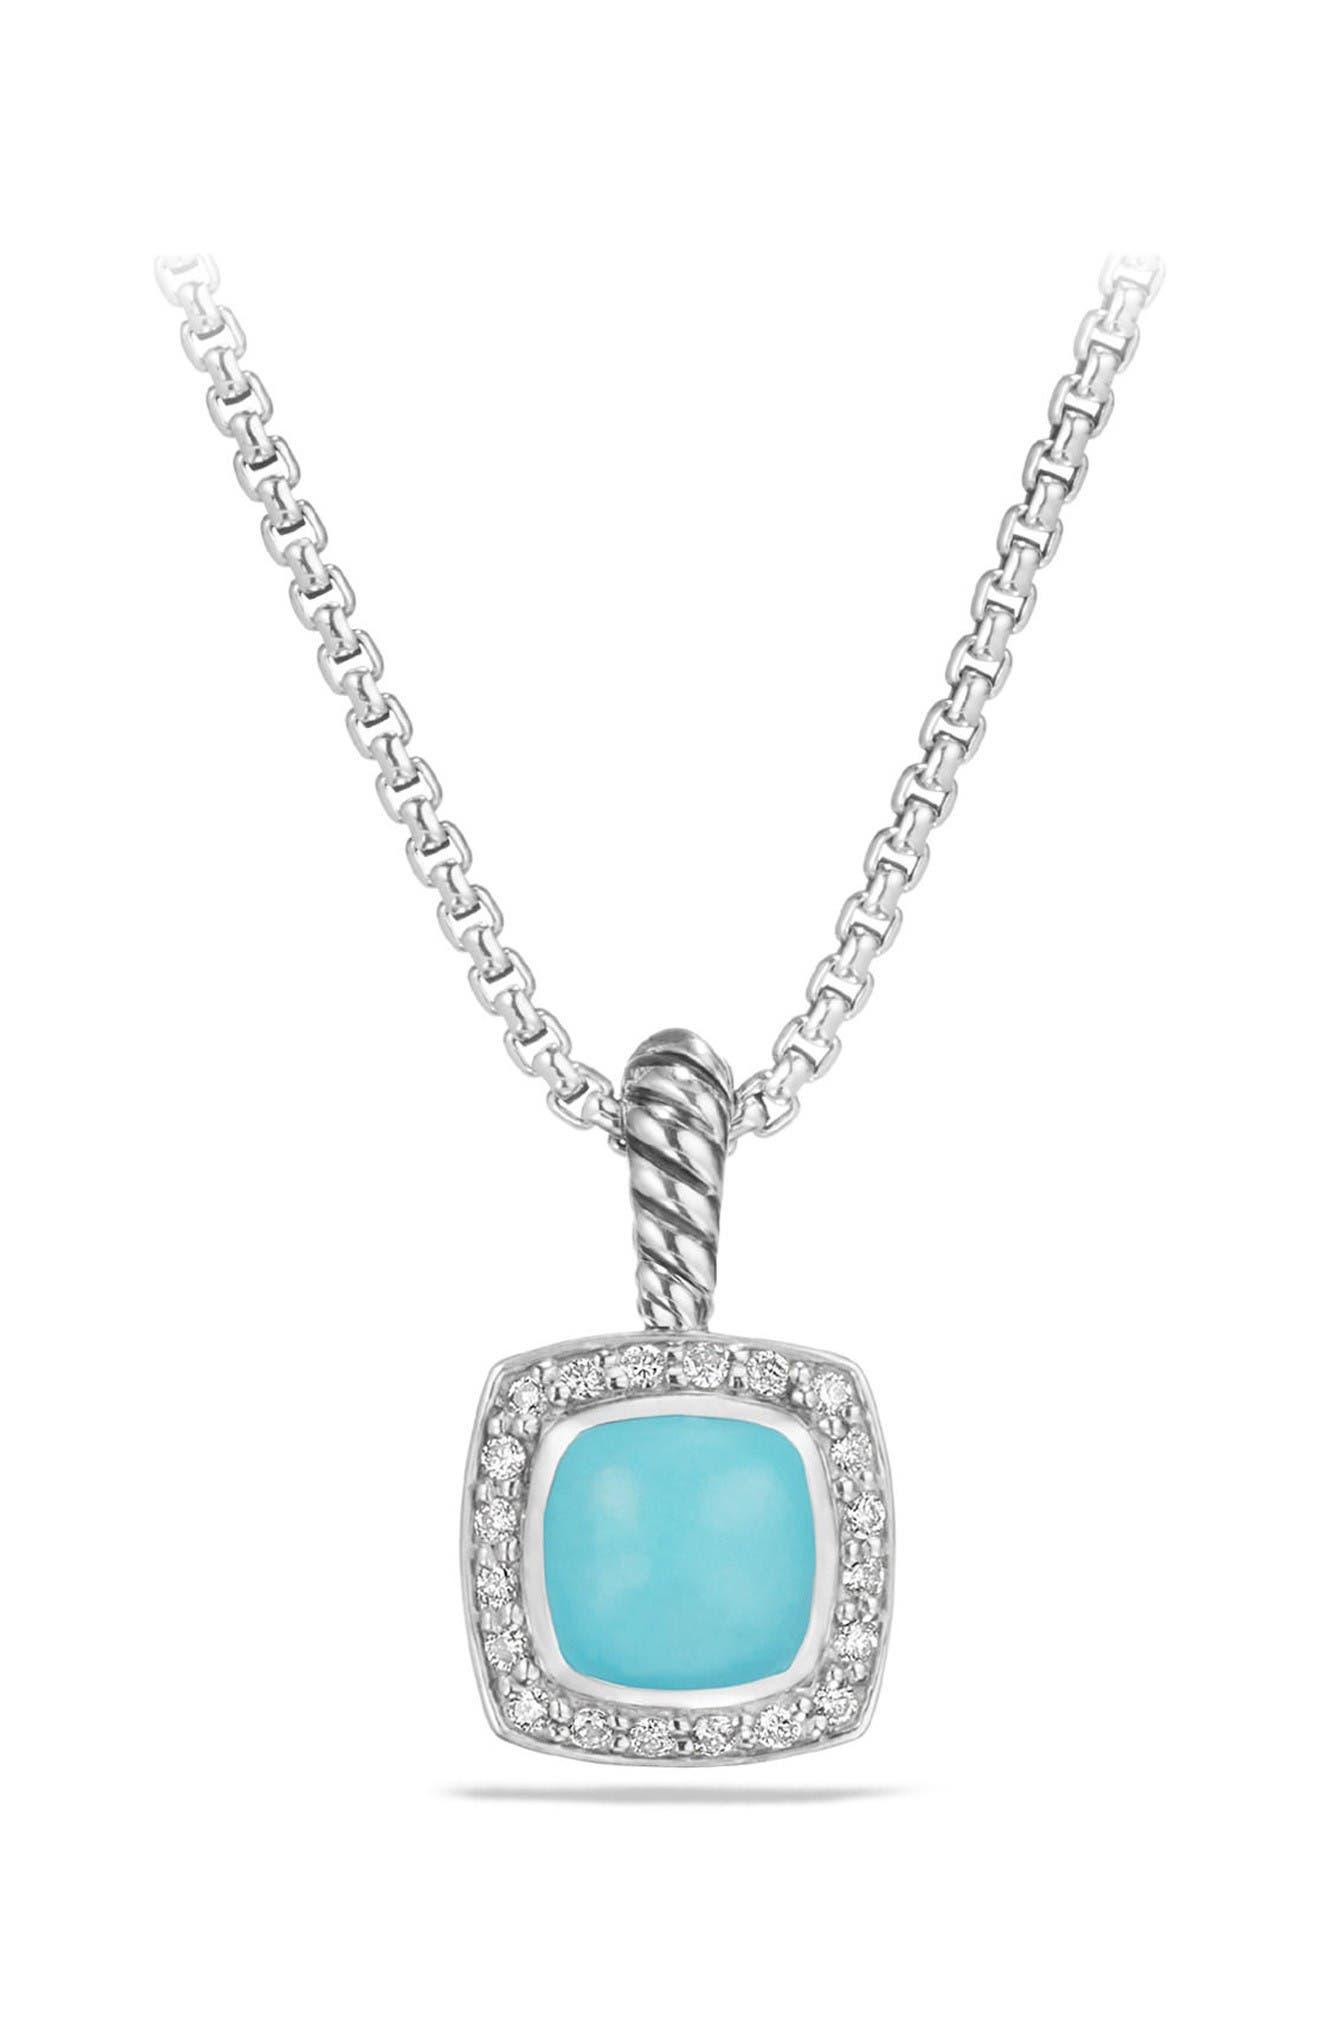 Alternate Image 1 Selected - David Yurman Petite Albion® Pendant Necklace with Diamonds